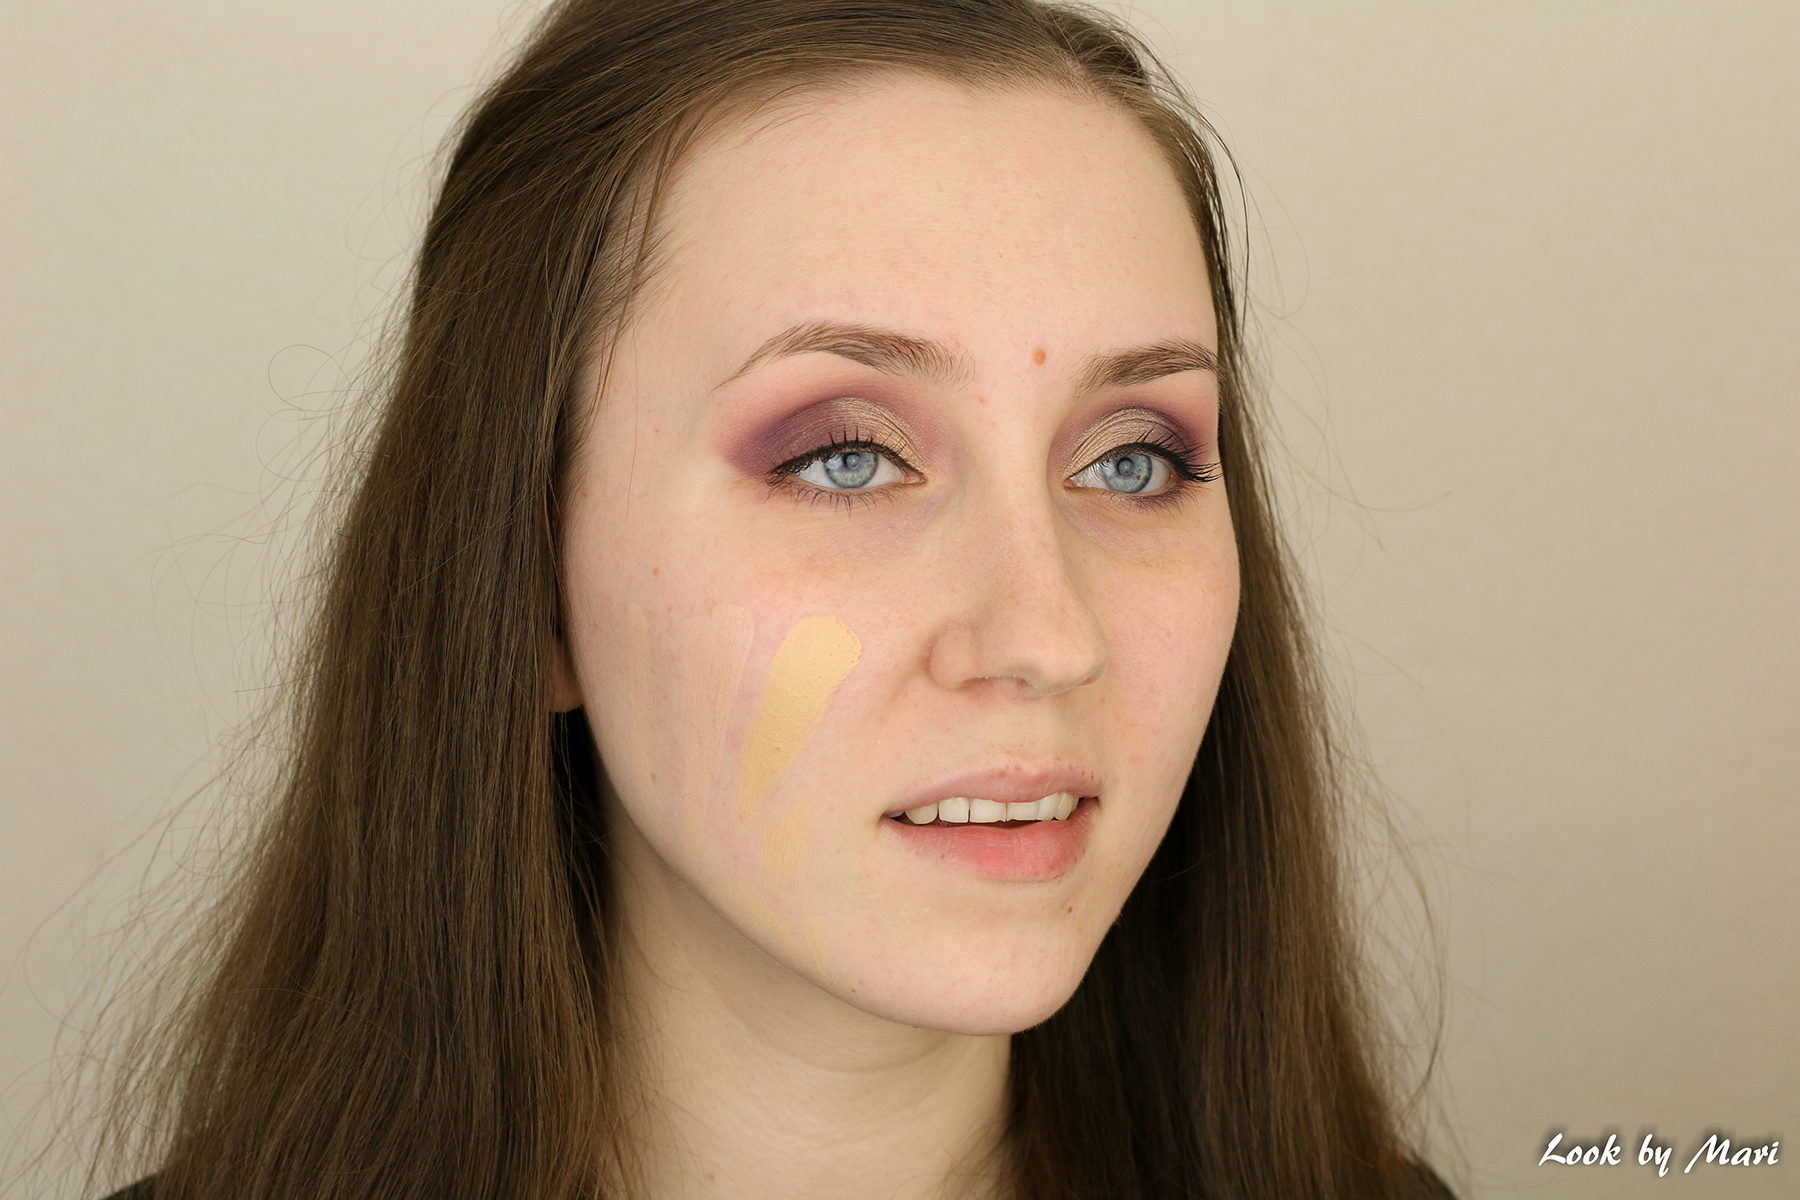 3 joe blasco ultrabase foundation review ultrabase meikkivoide kokemuksia